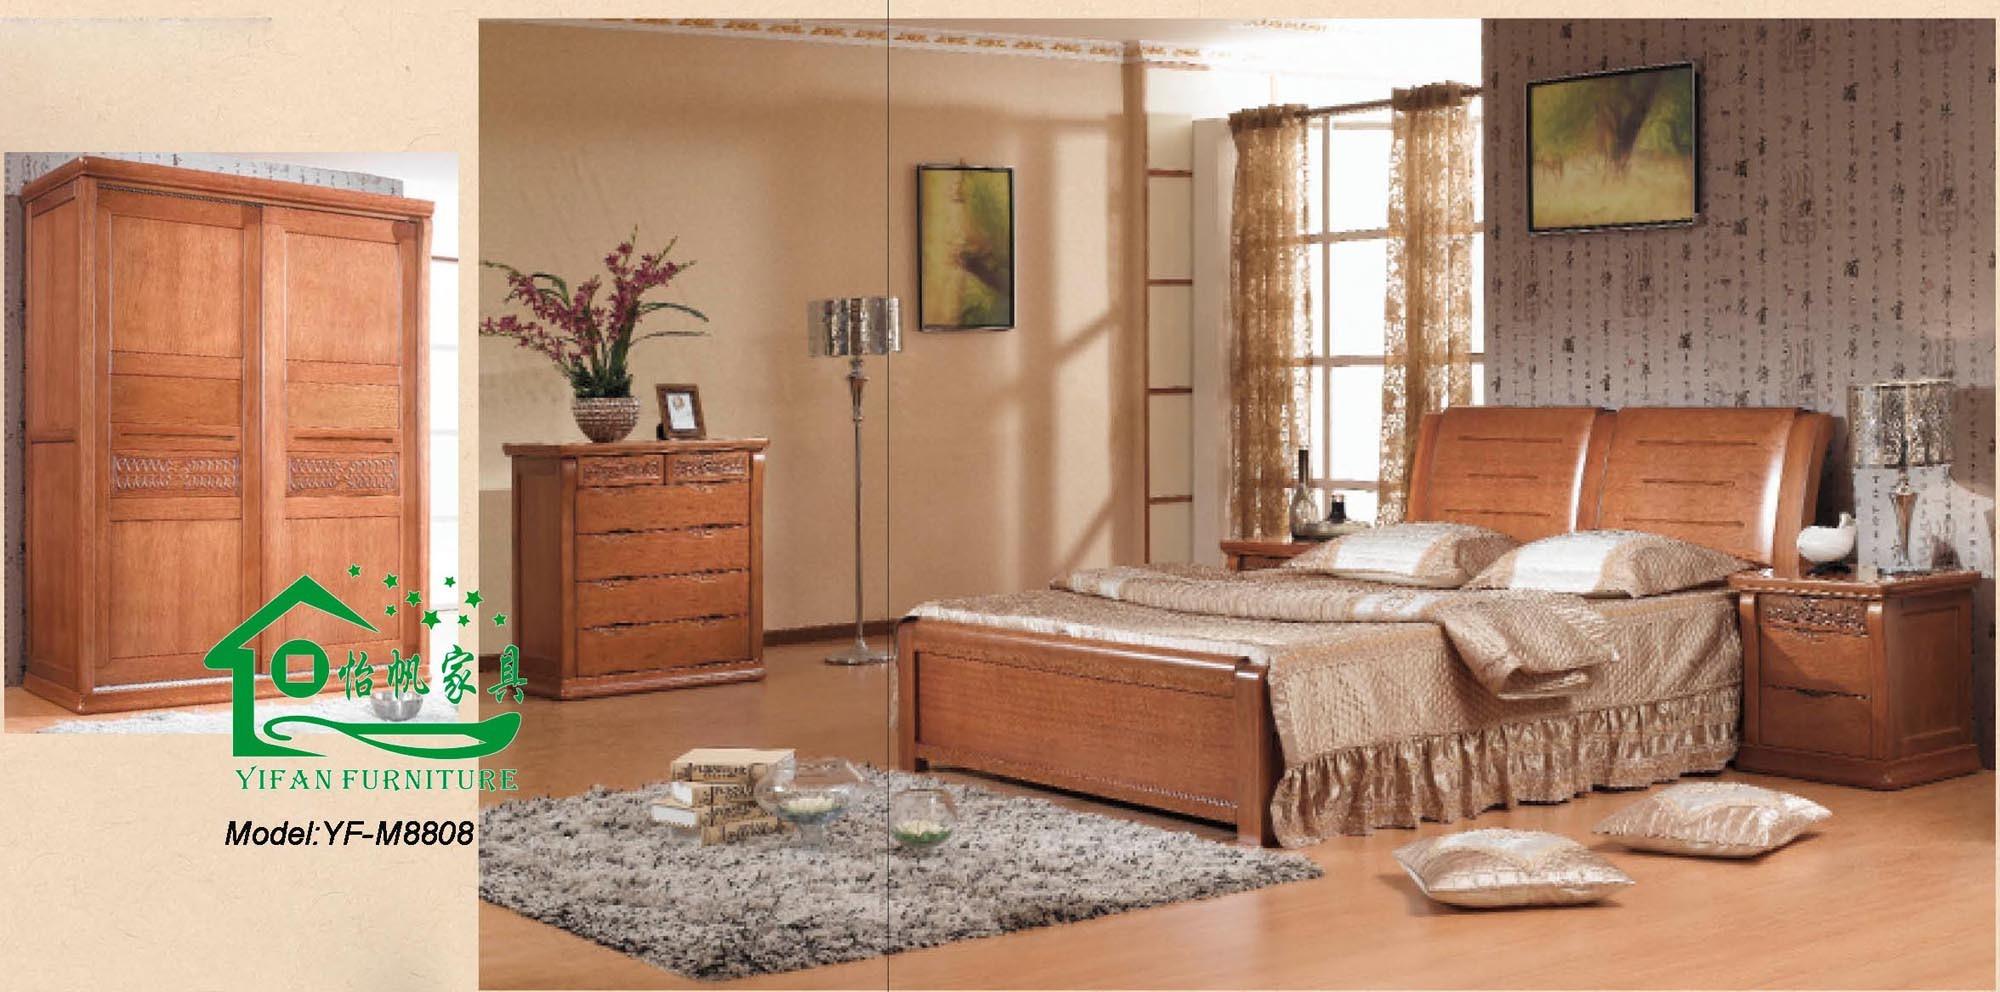 Bedroom furniture with 80 inch bed w830 bedroom furniture with 80 inch bed w830 fournis par - Les chambre a coucher en bois ...